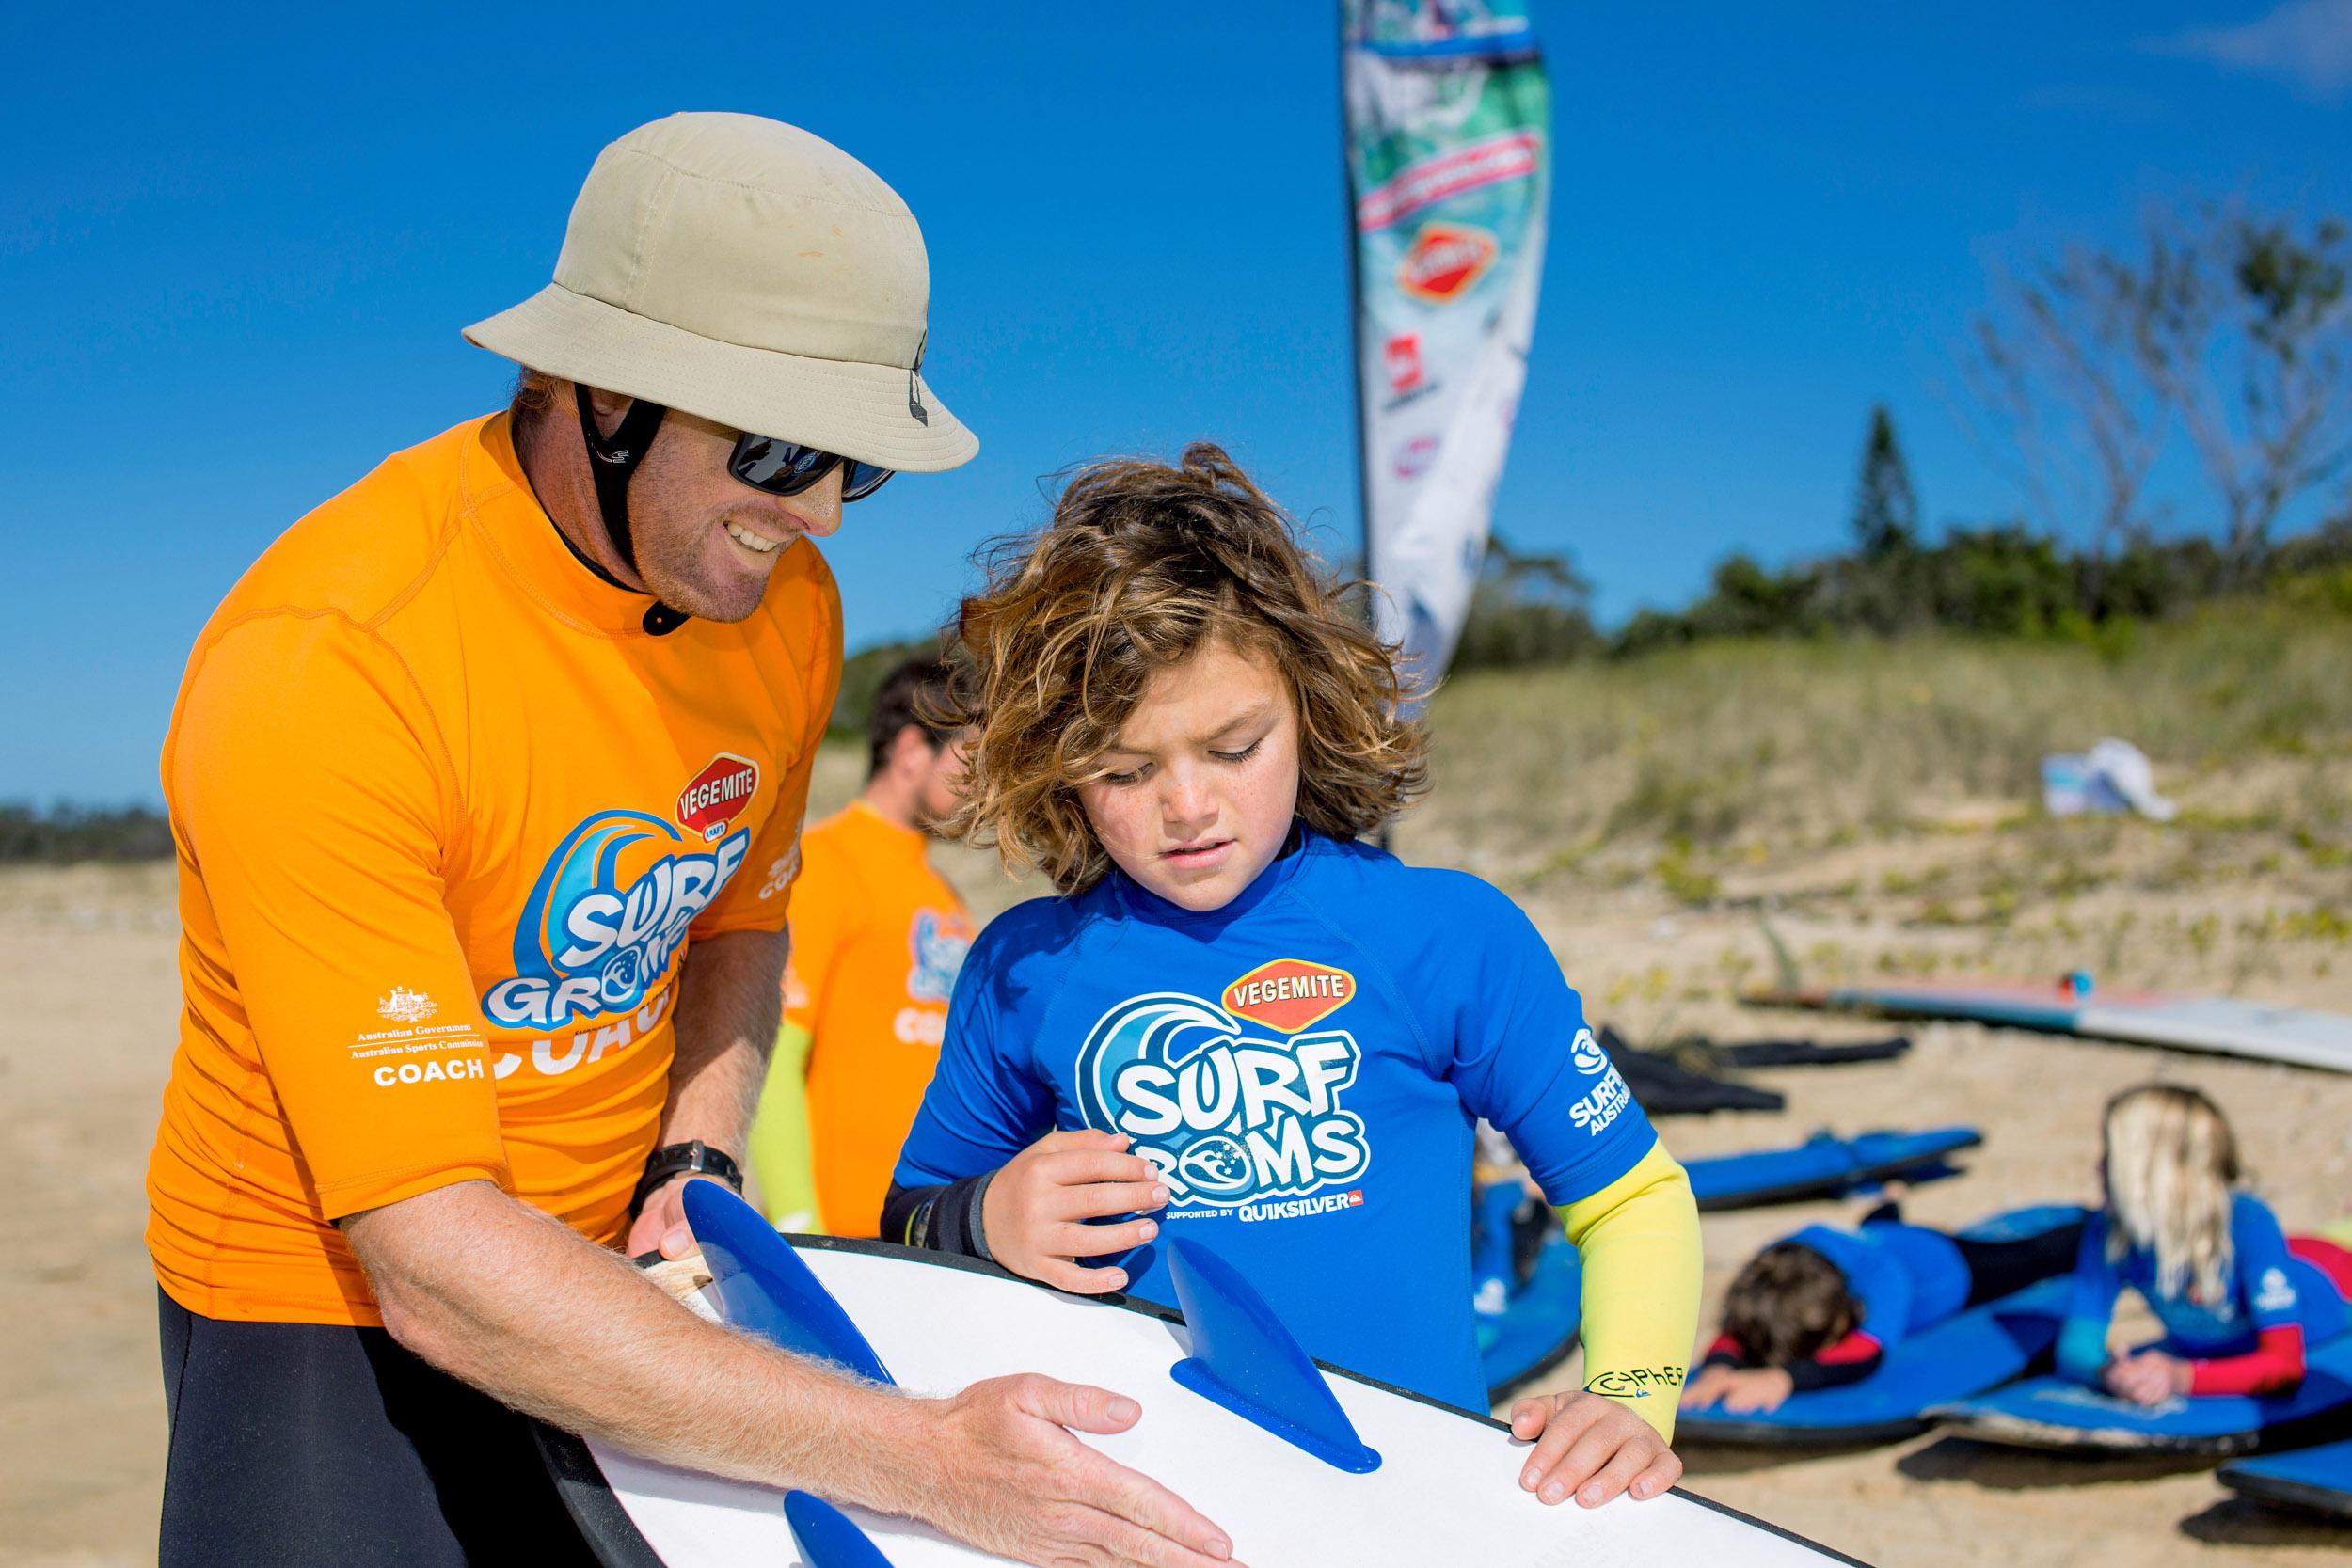 surfing-australia-surf-groms-photography-JSG-153.jpg